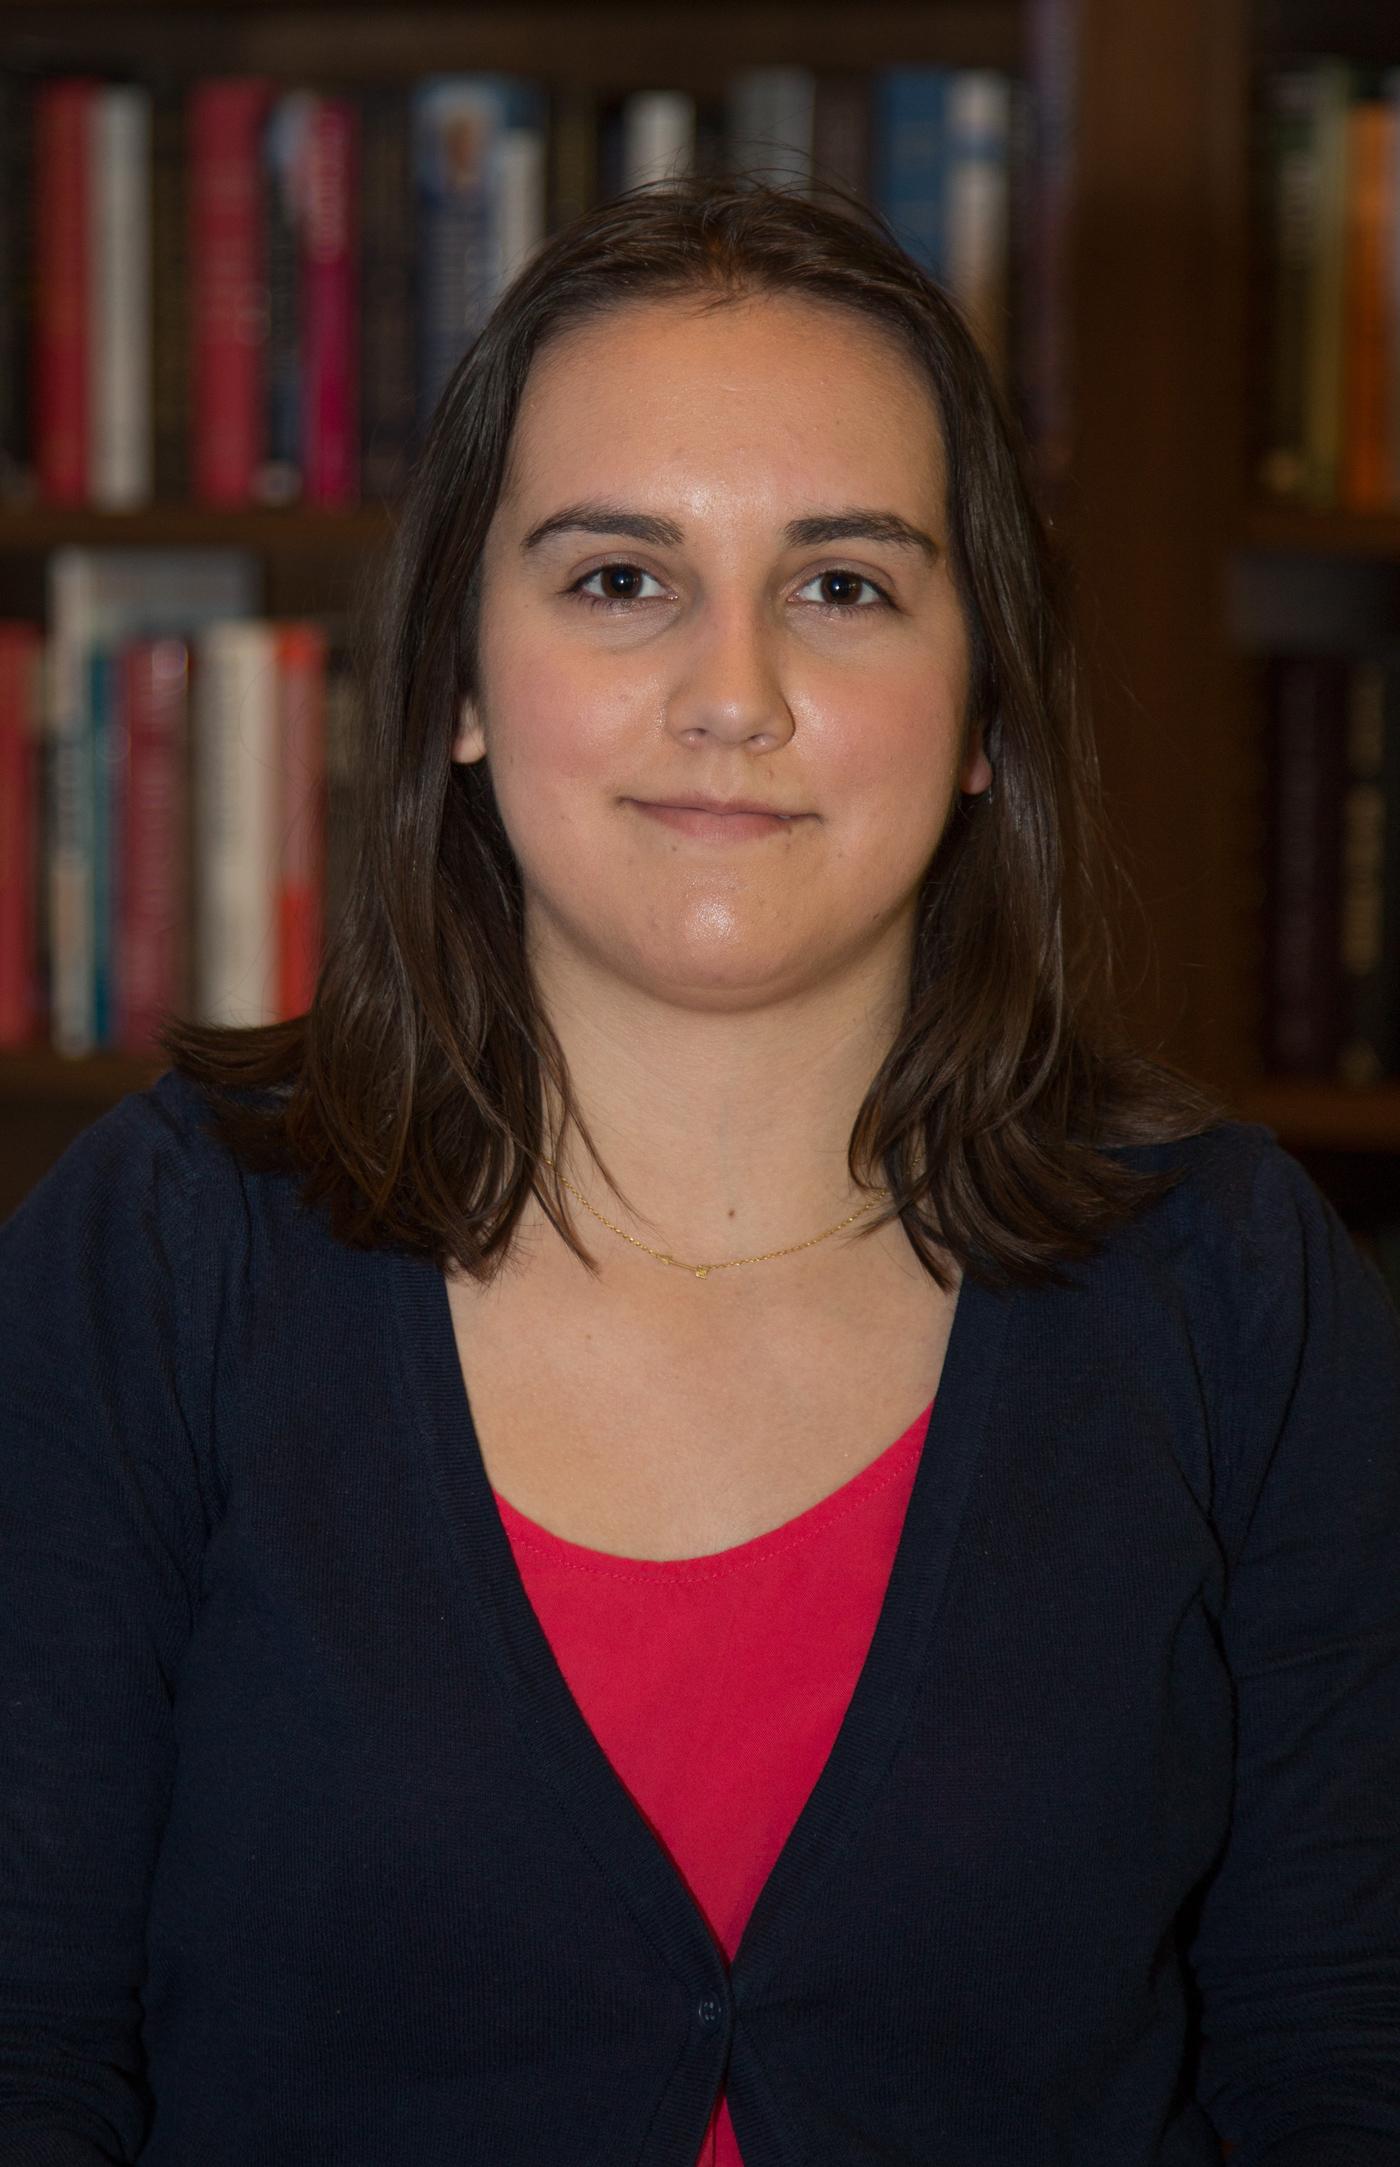 Lauren Aguirre